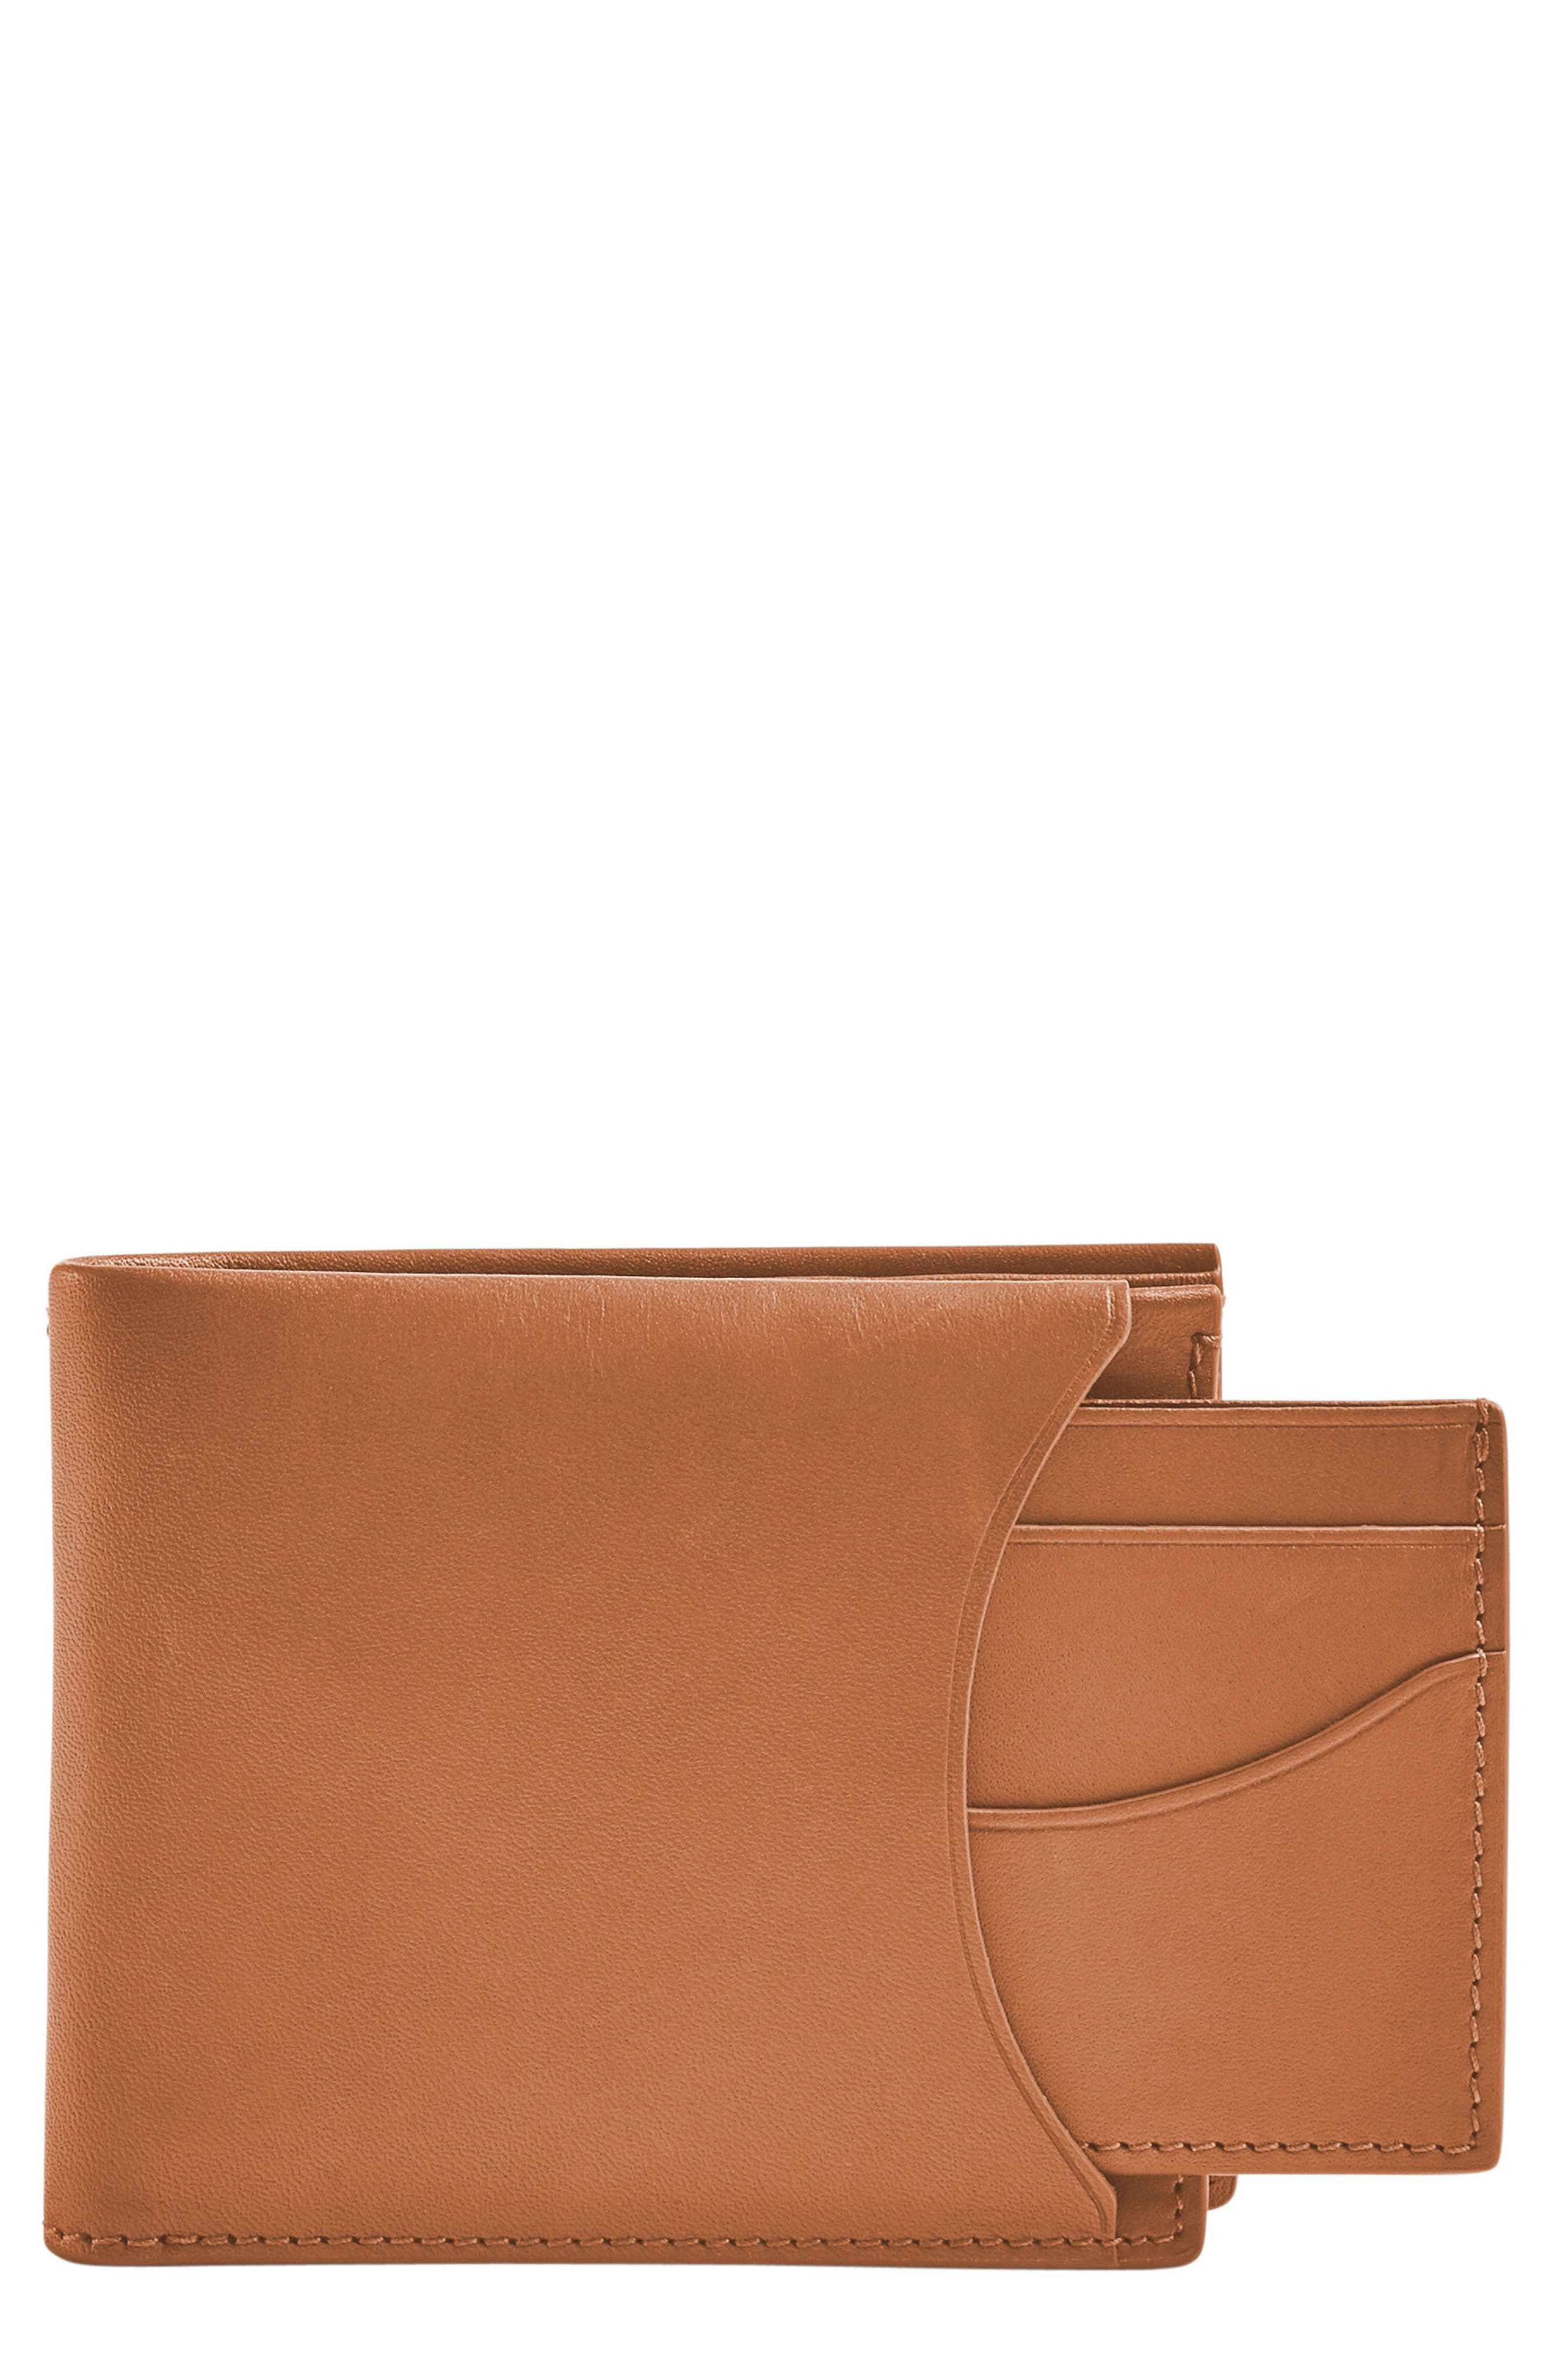 SKAGEN Leather Passcase Wallet